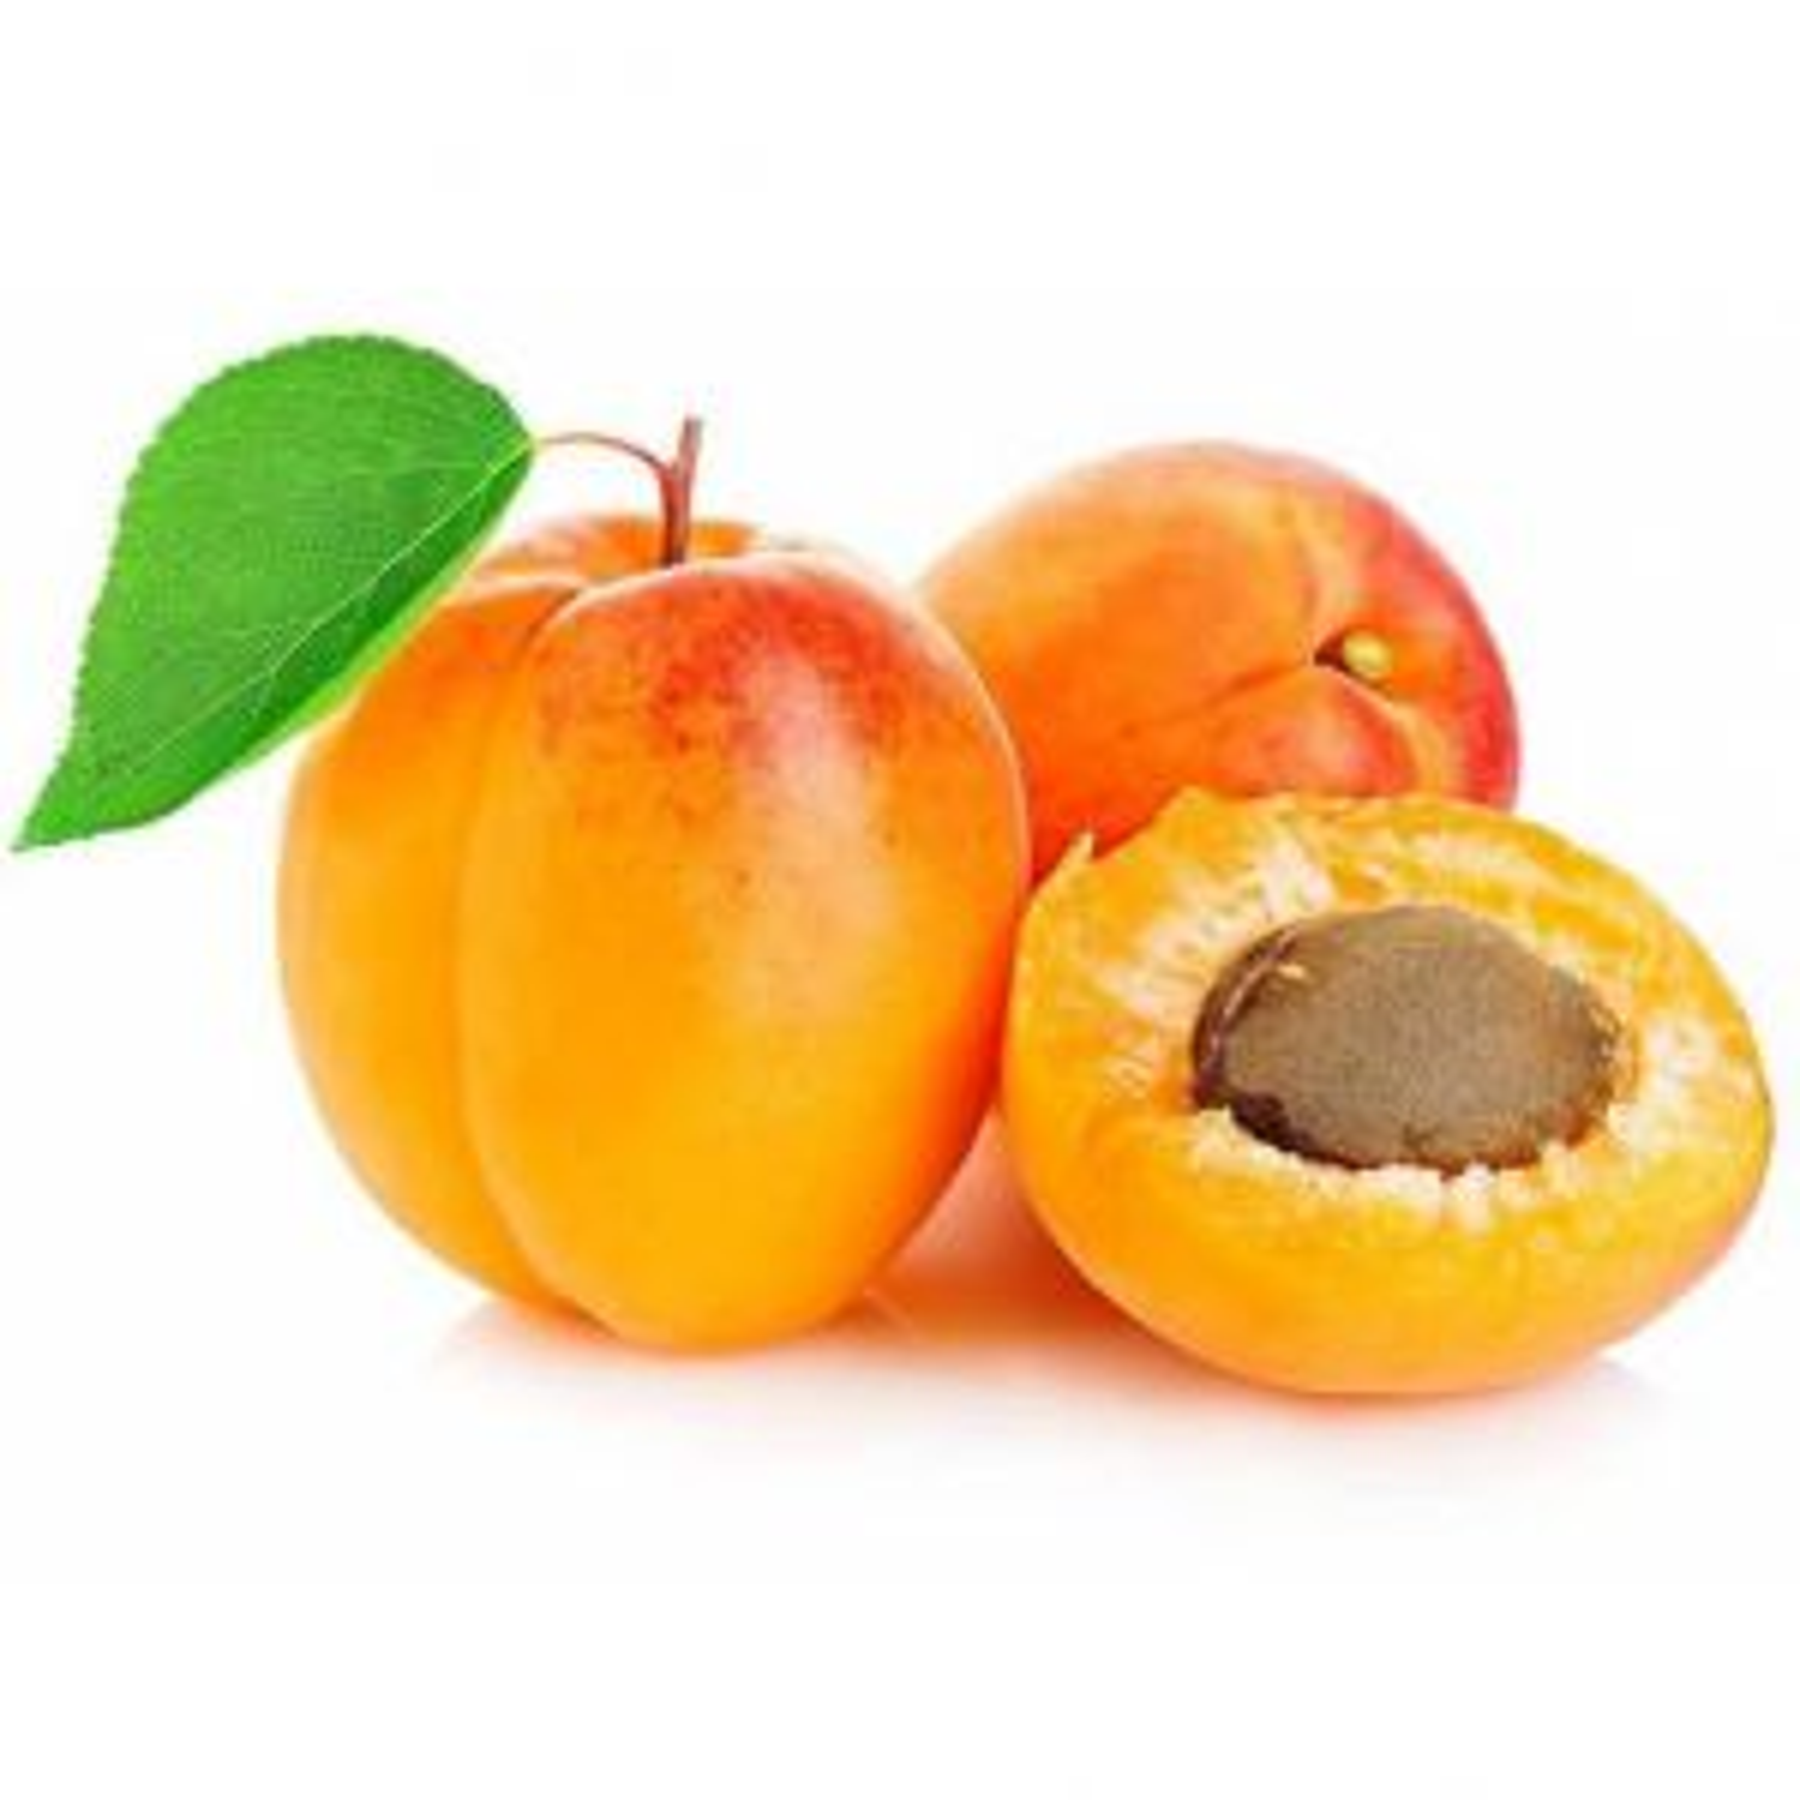 Skoddejuice Apricot Aroma